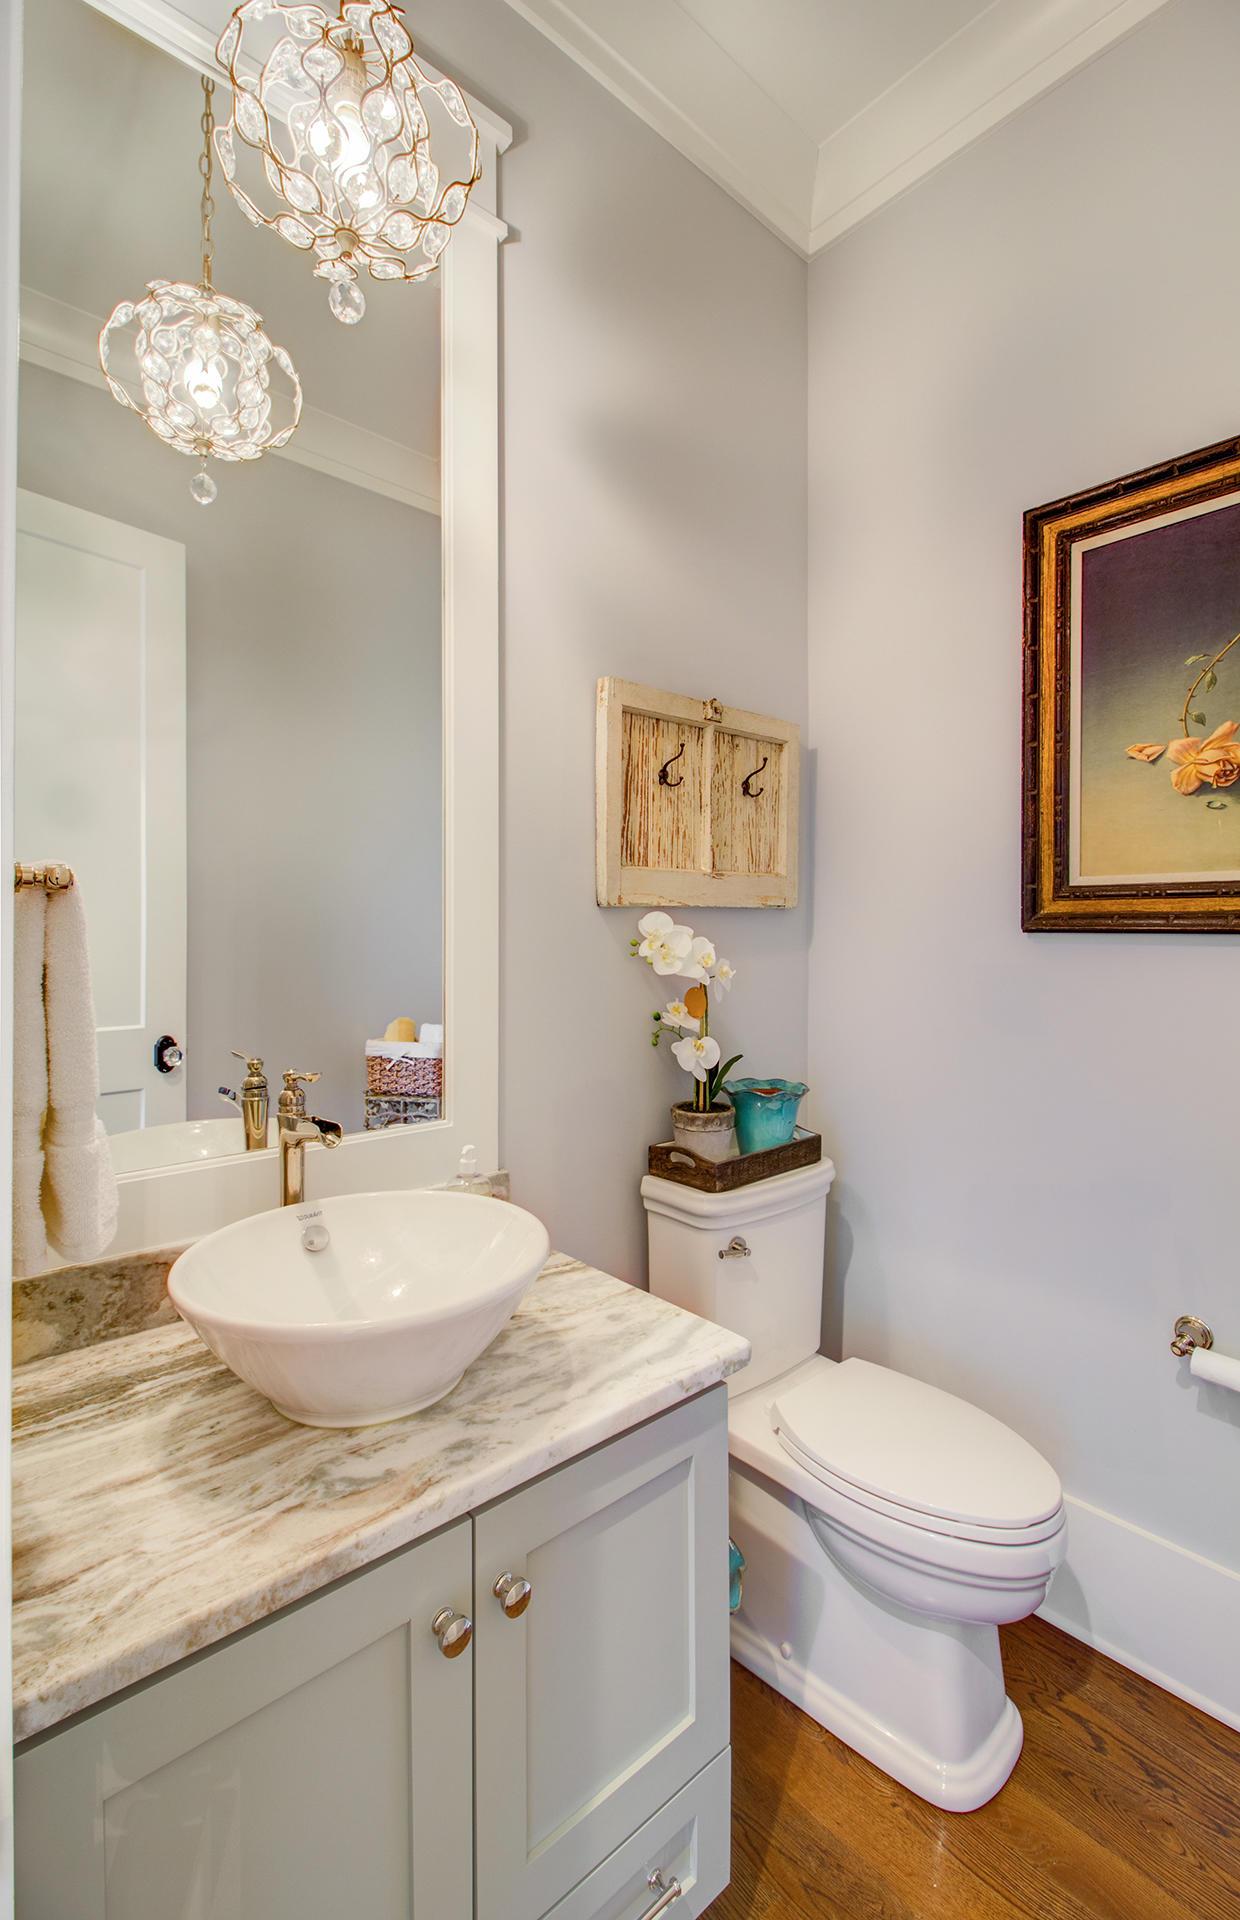 Daniel Island Park Homes For Sale - 117 Brailsford, Charleston, SC - 40